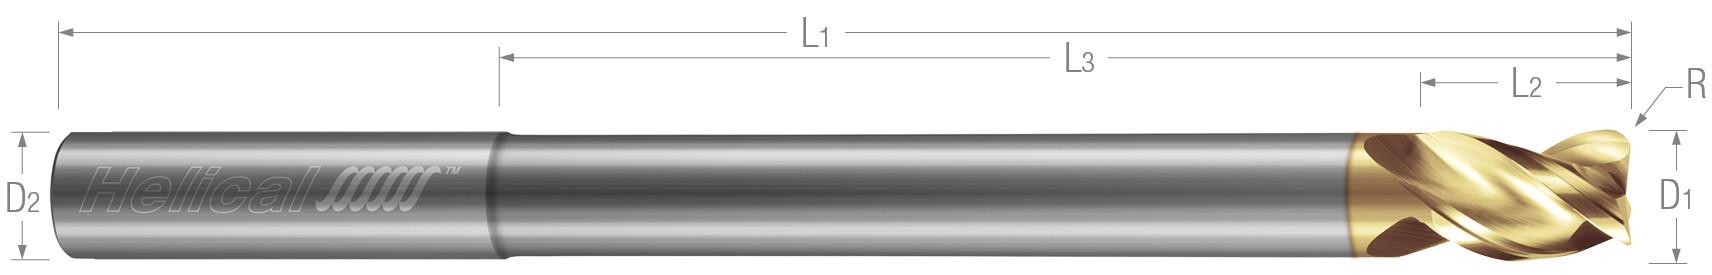 tool-details-46631